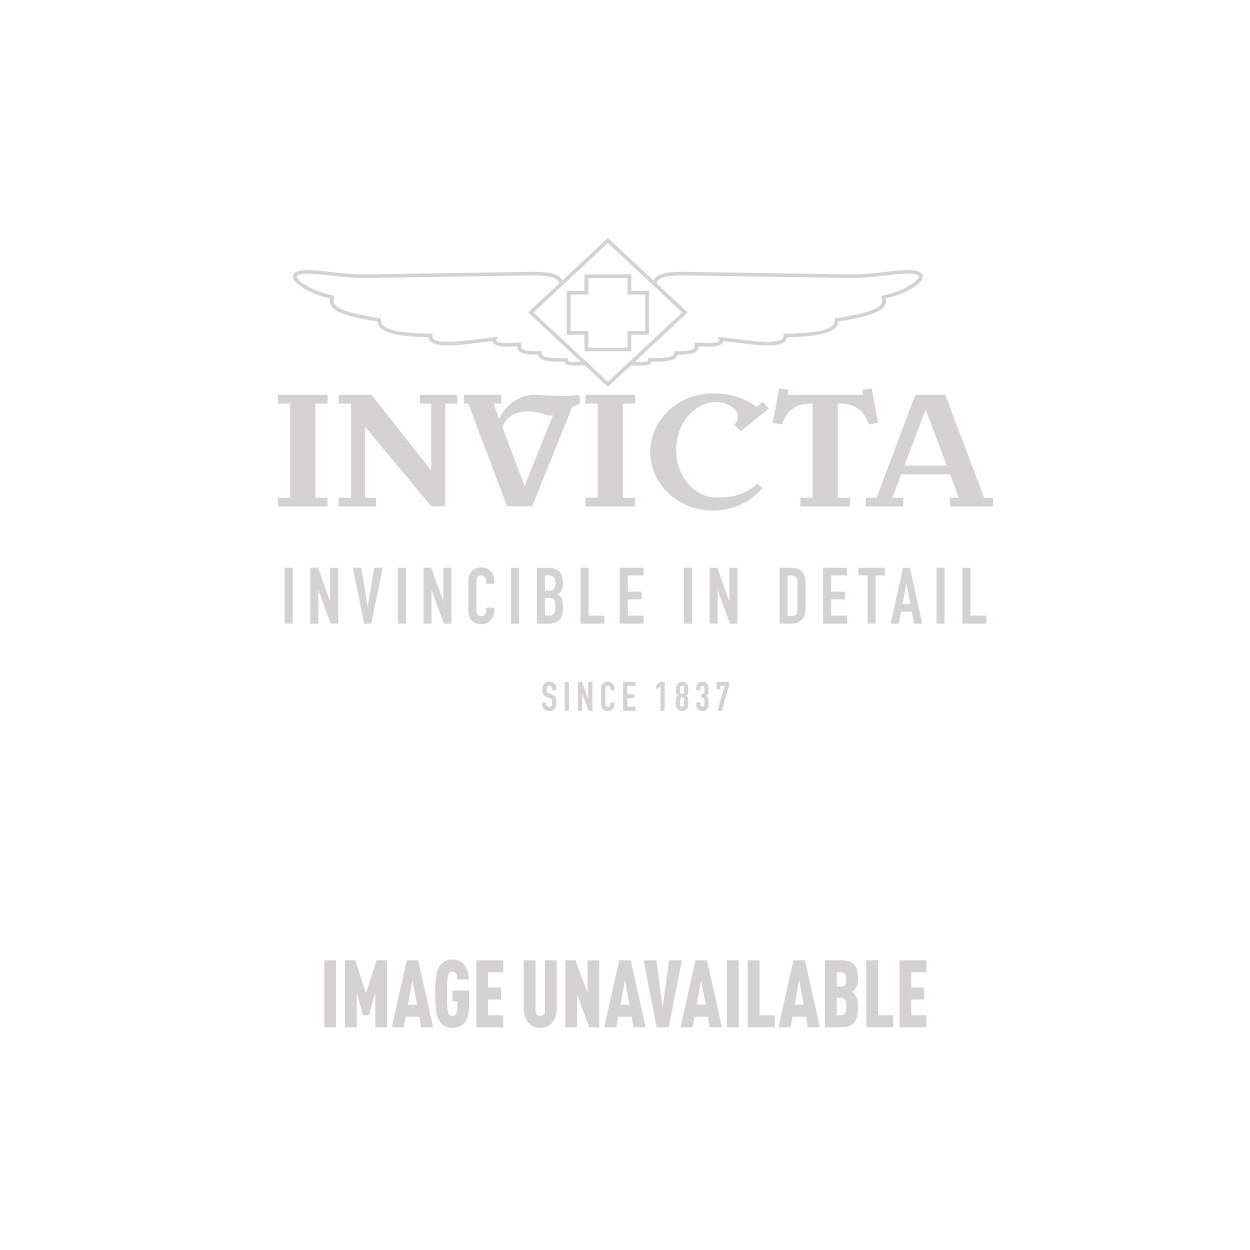 Invicta S1 Rally Quartz Watch - Black case with Black, Purple tone Polyurethane band - Model 20219